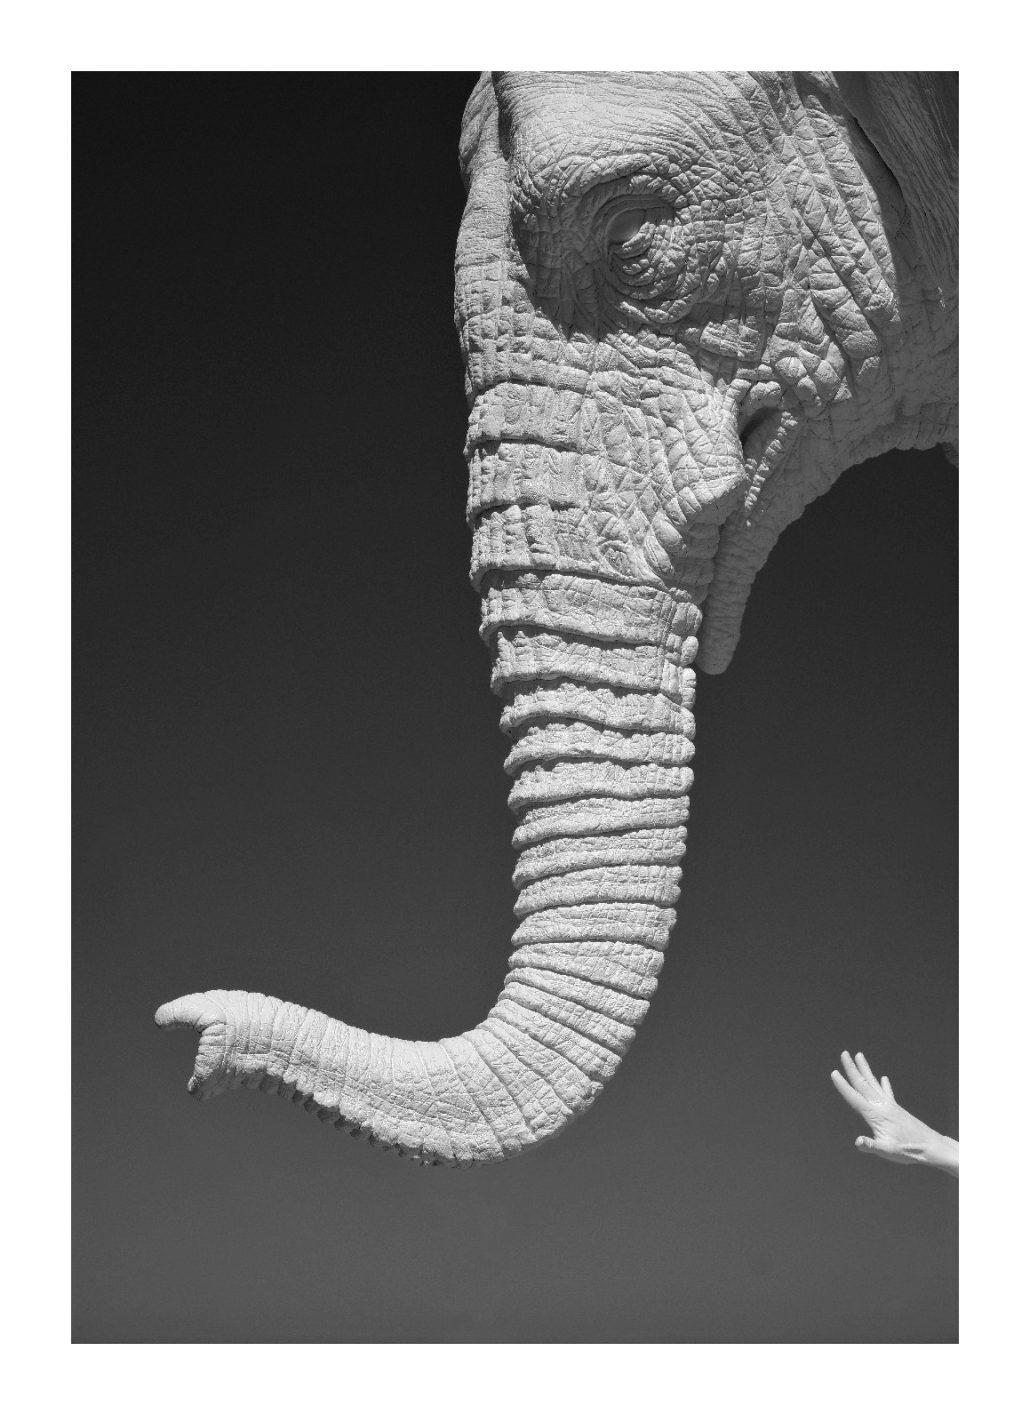 Elephantissime!